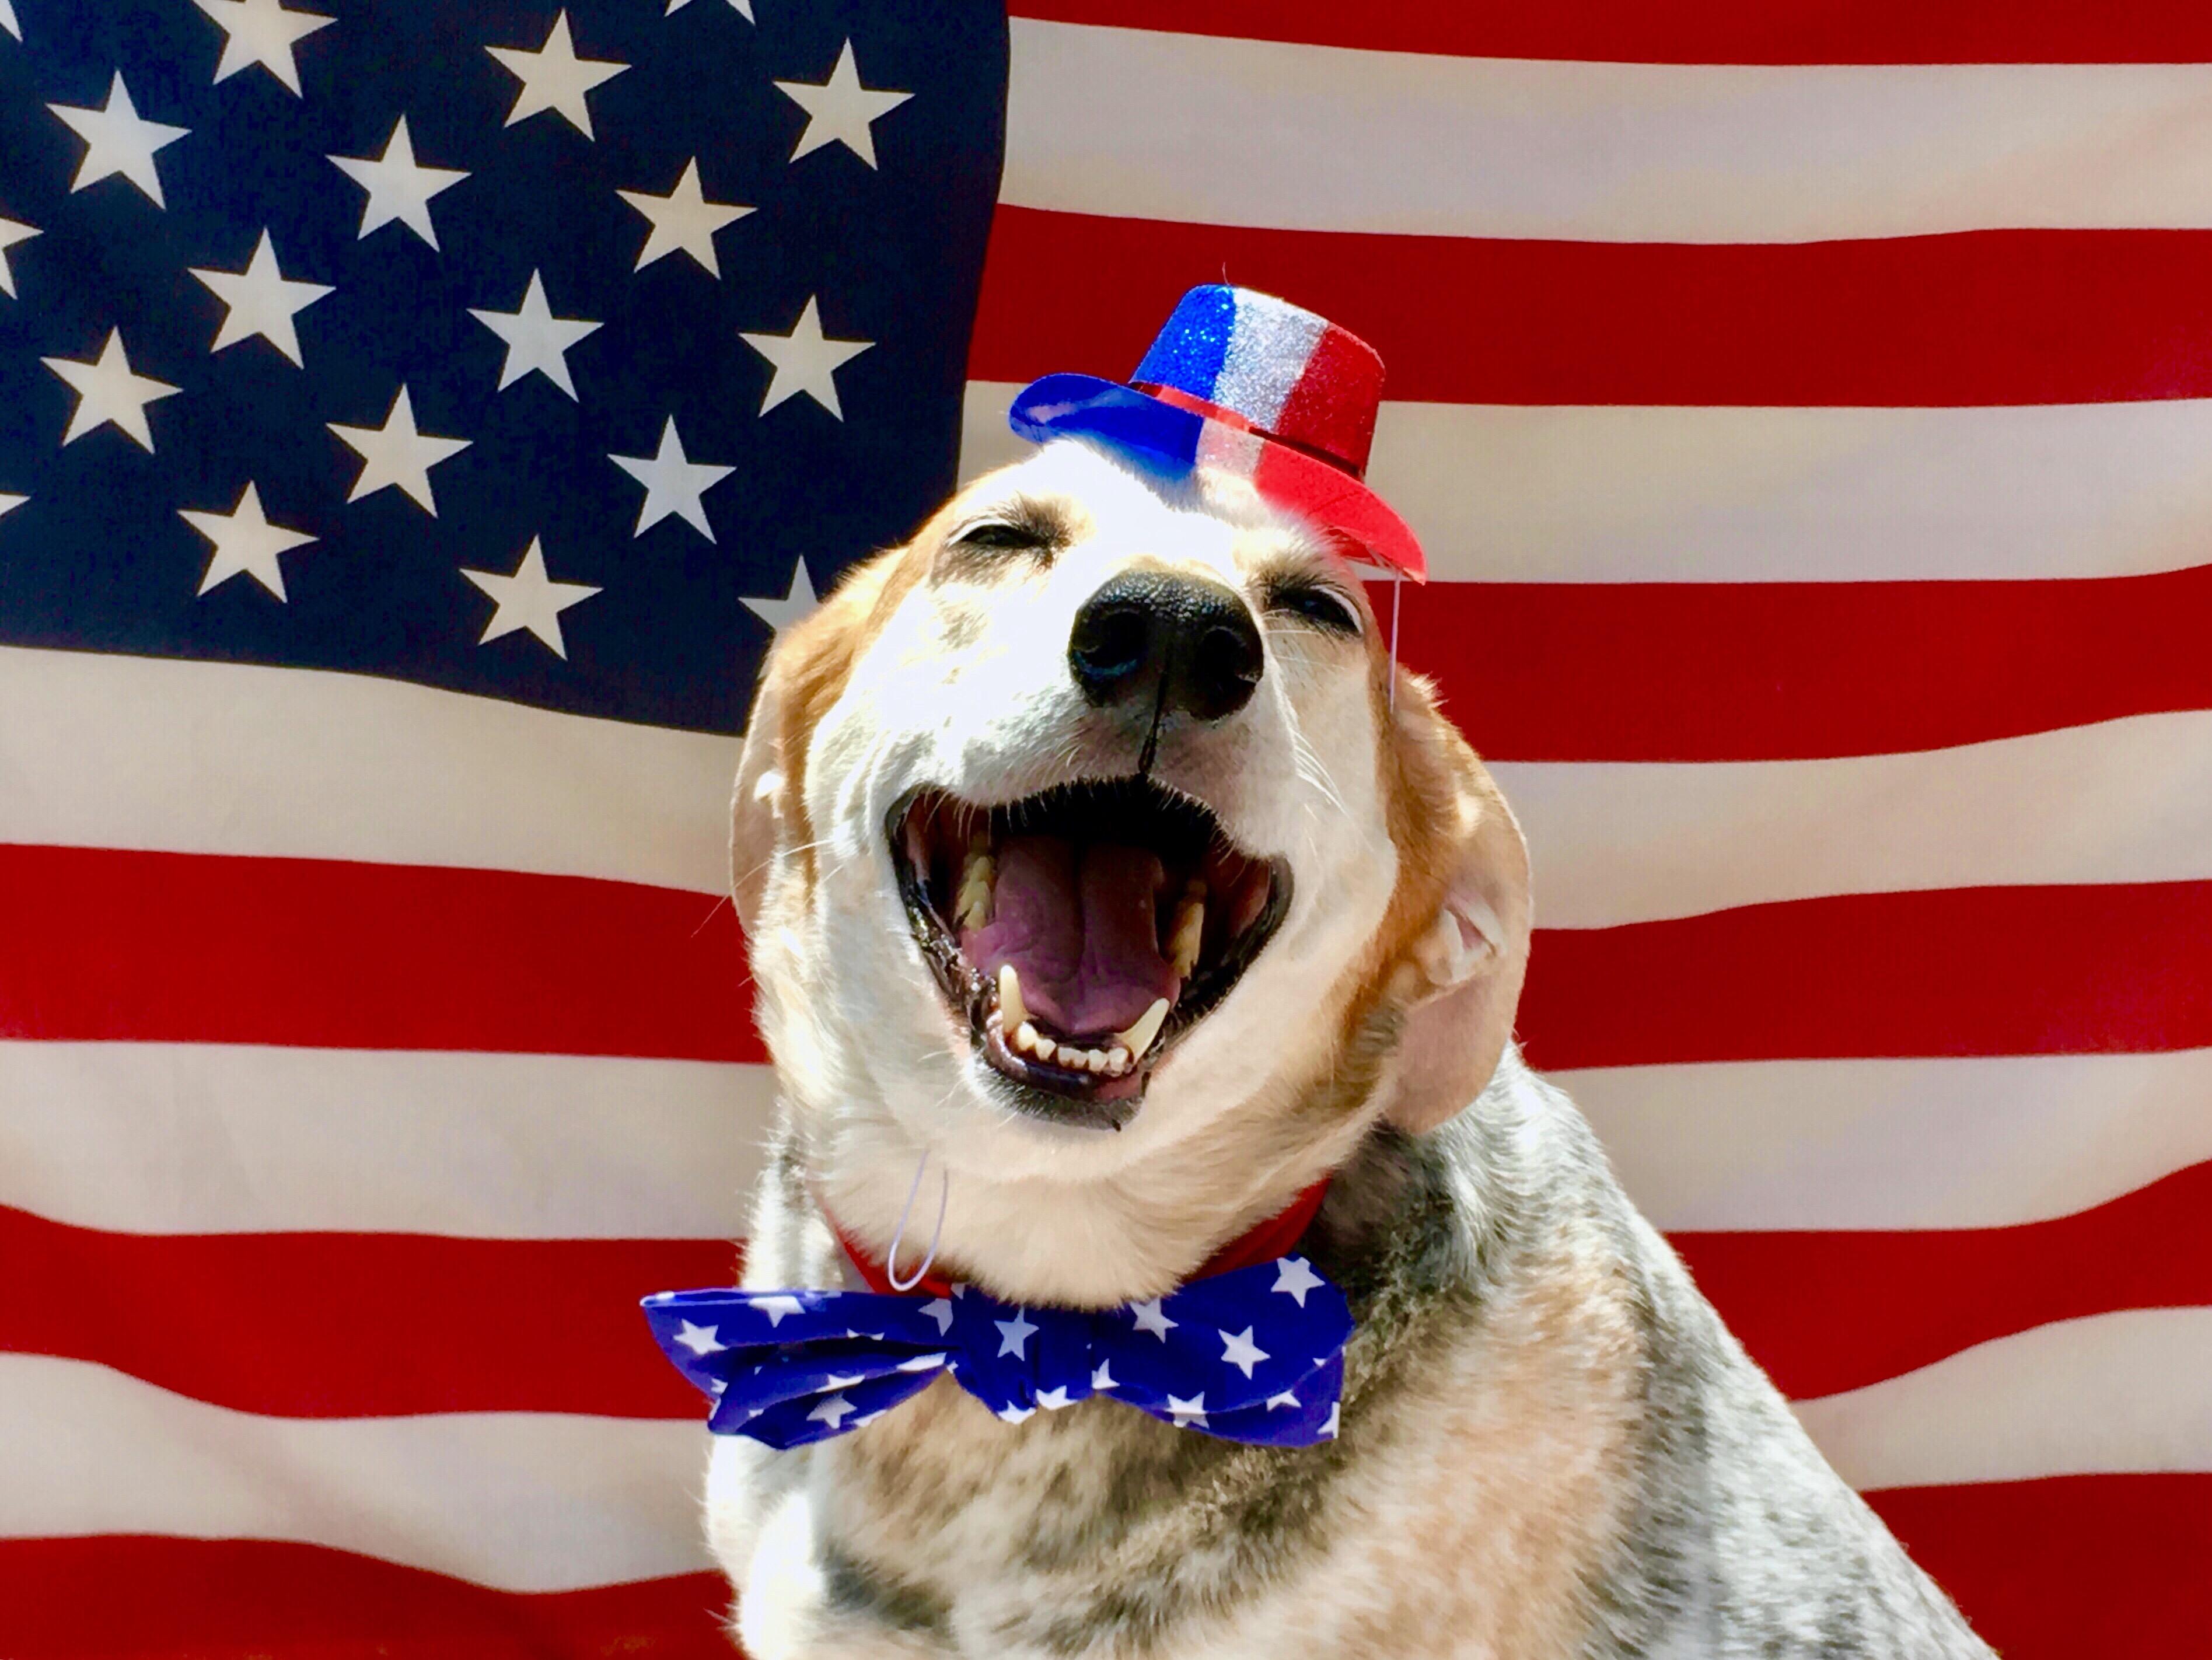 happy-fourth-of-july-dog-in-stars-and-stripes-atti-z4d6g5q.jpg